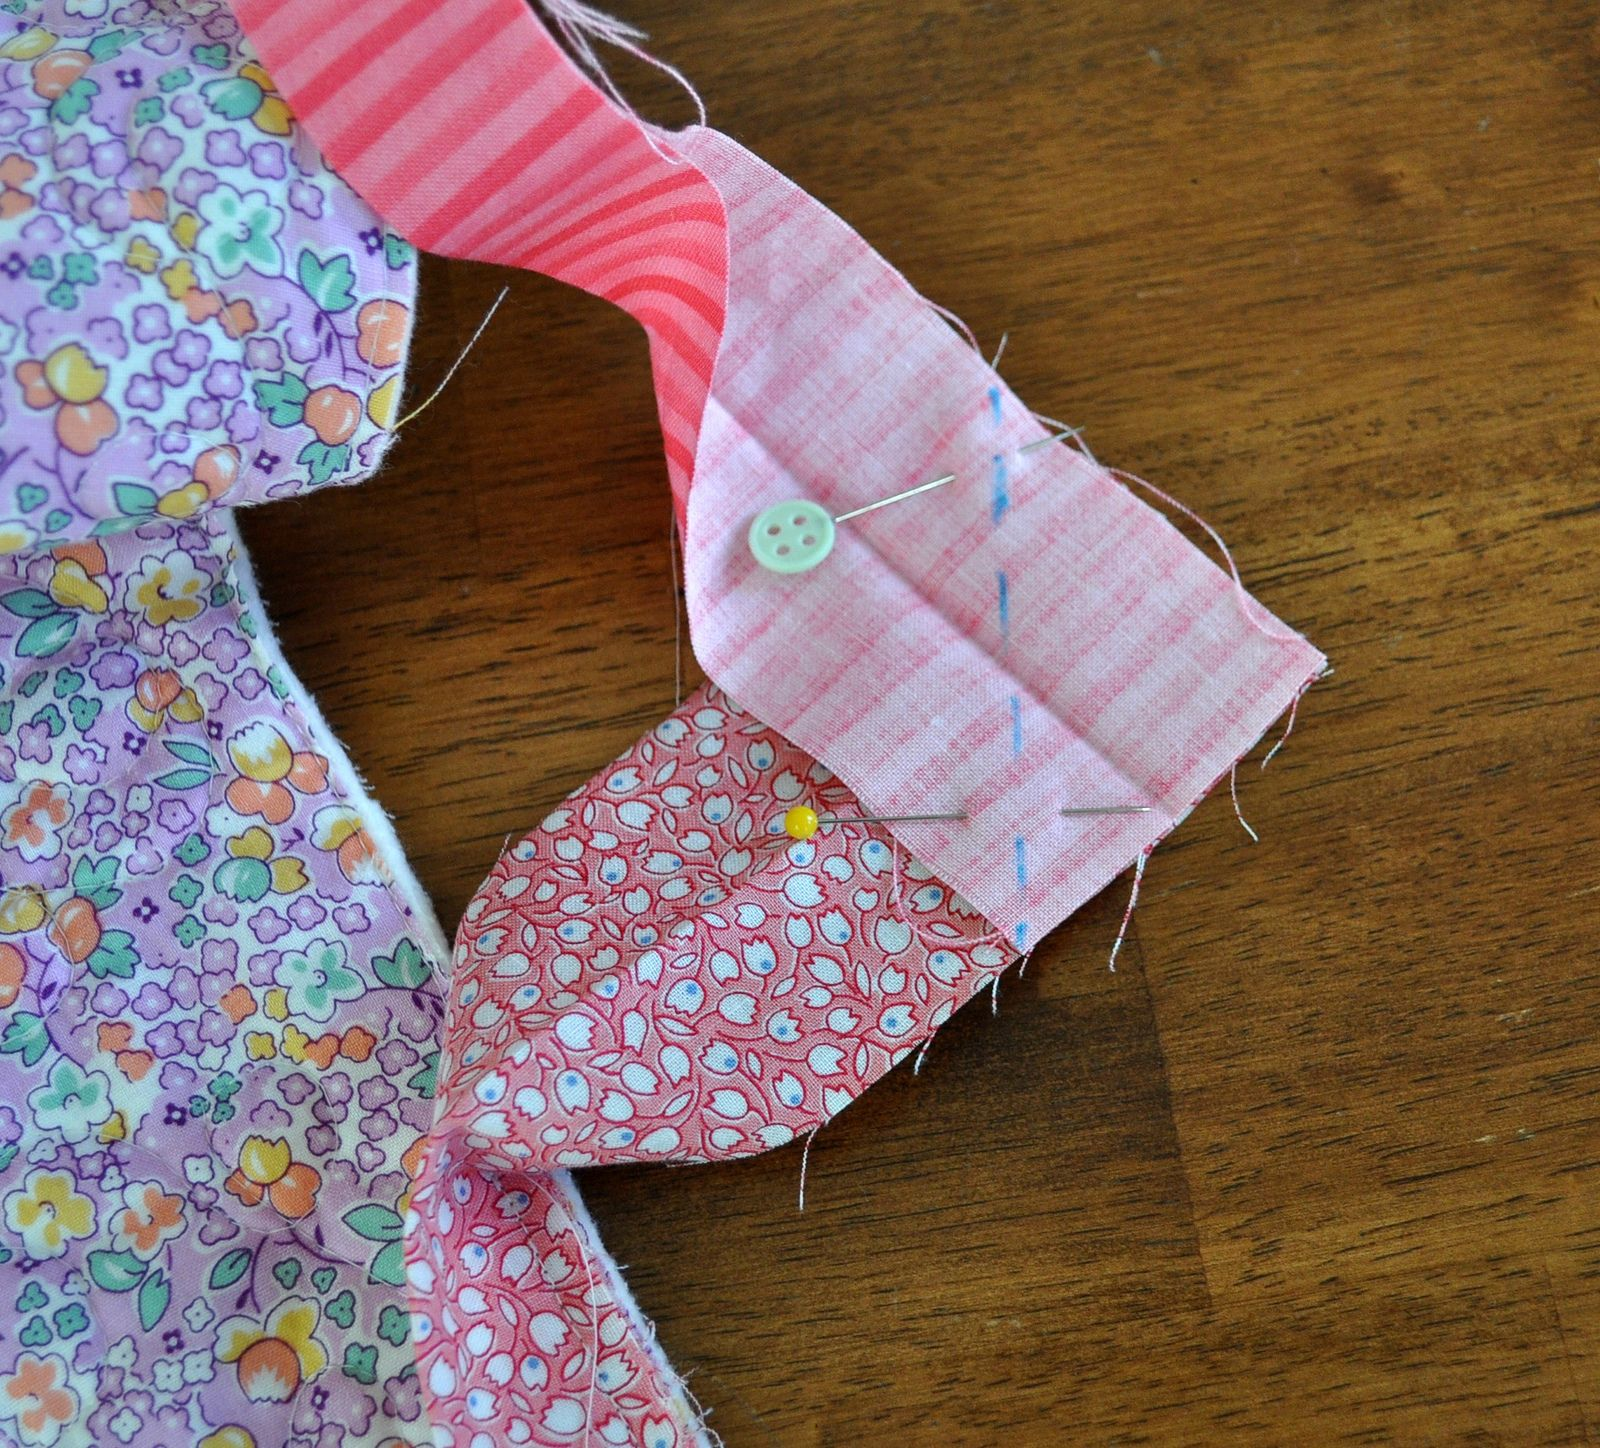 Quilt Binding, Quilt Binding Tutorial, How To